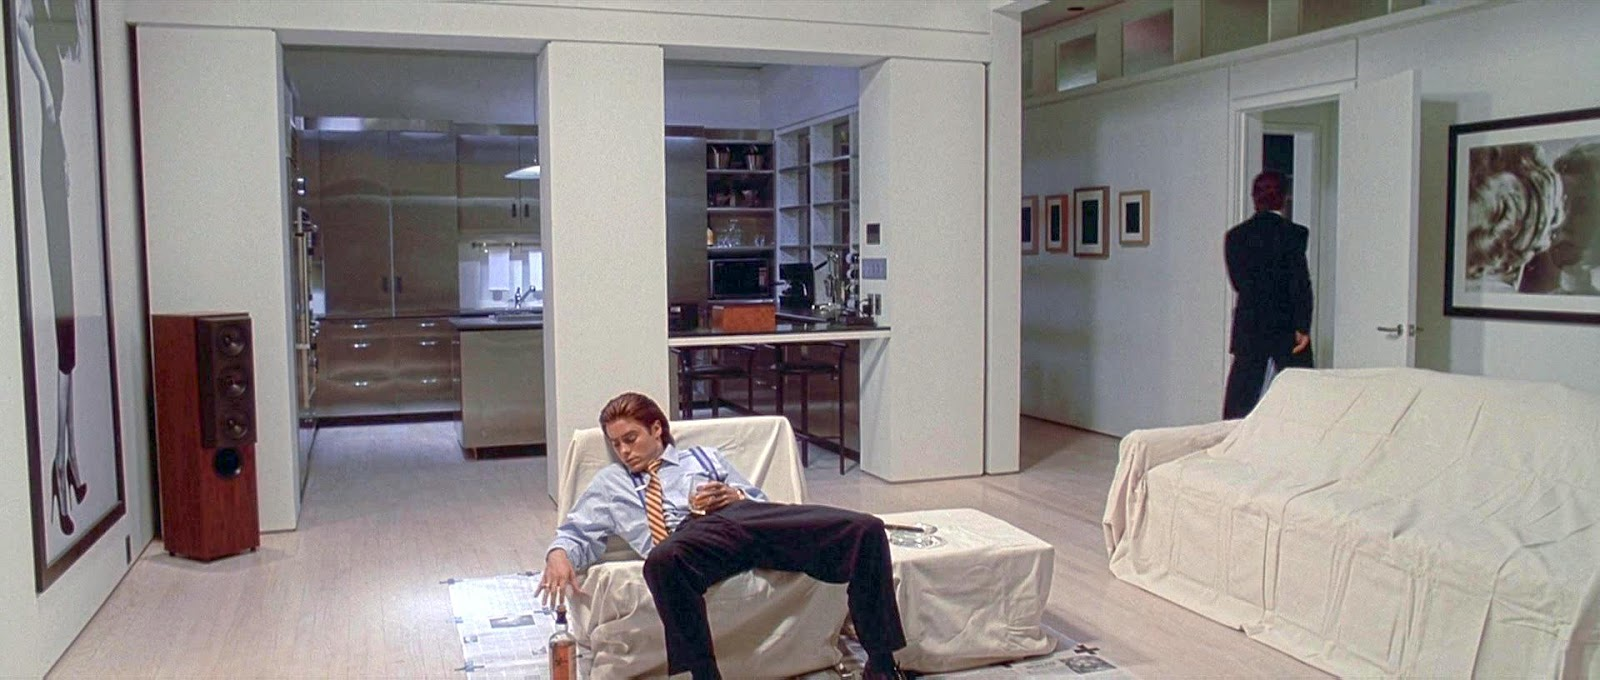 ../../../../../../Desktop/American-Psycho-Apartment-Sce